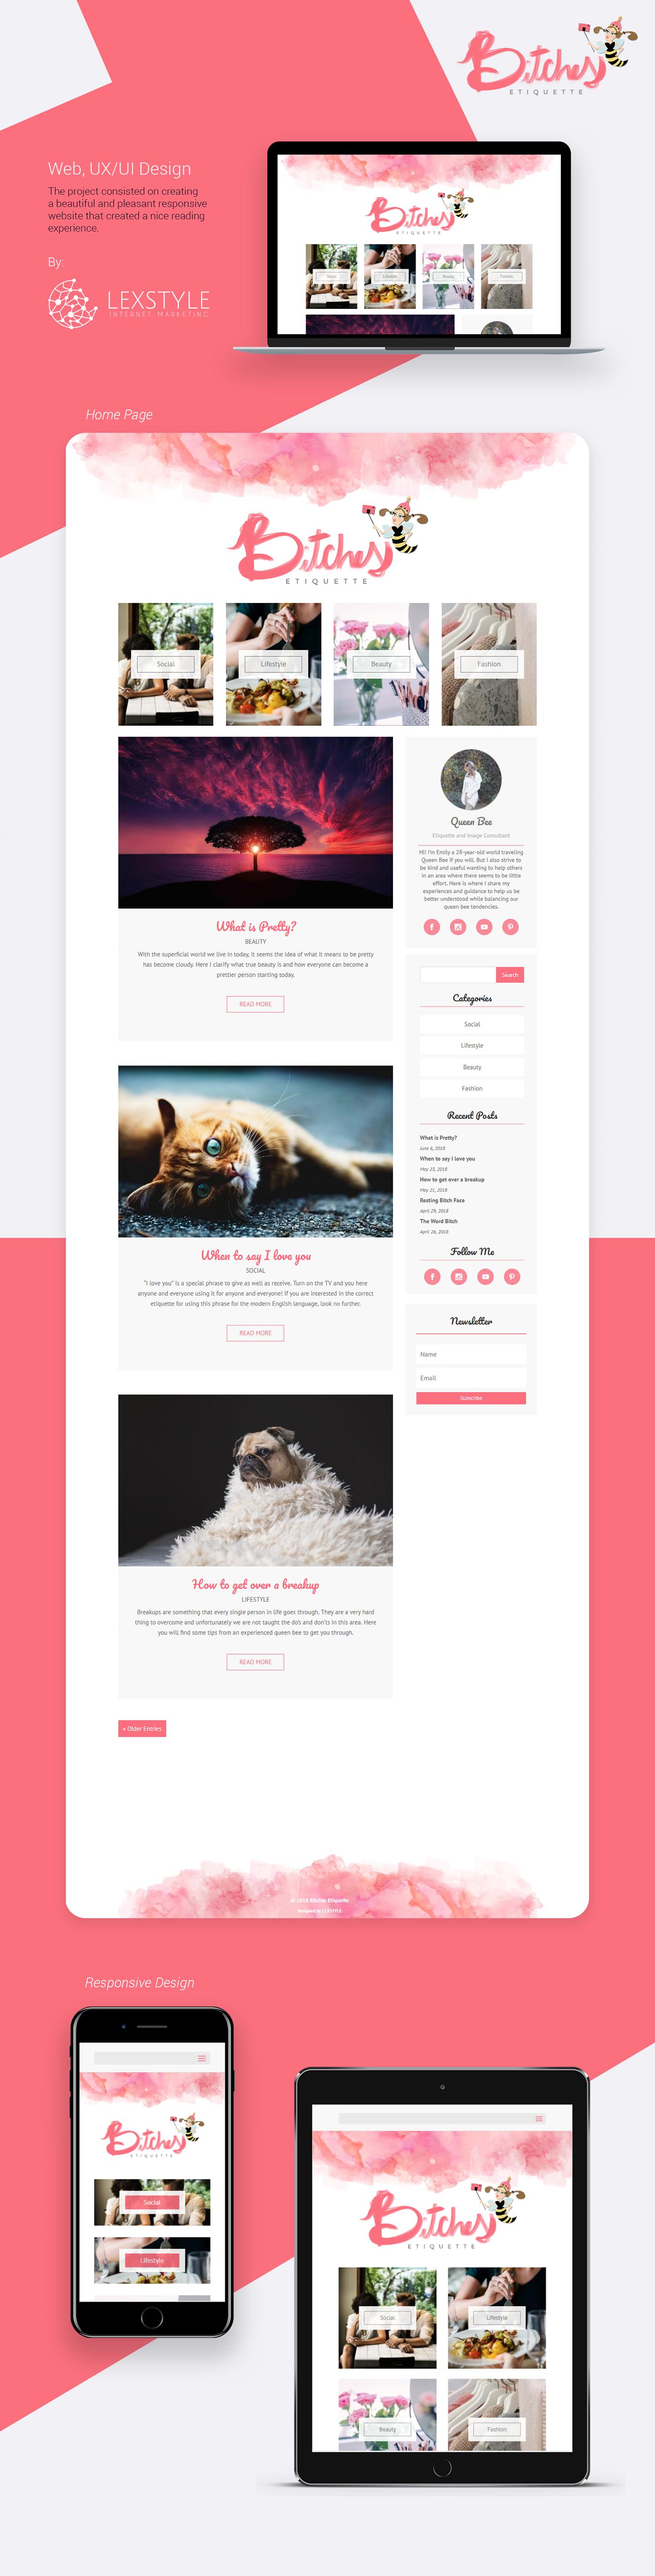 Webdesign uidesign uxdesign interactiondesign lexstyle Website Webdevelopment femeninedesign womendesign PinkDesign